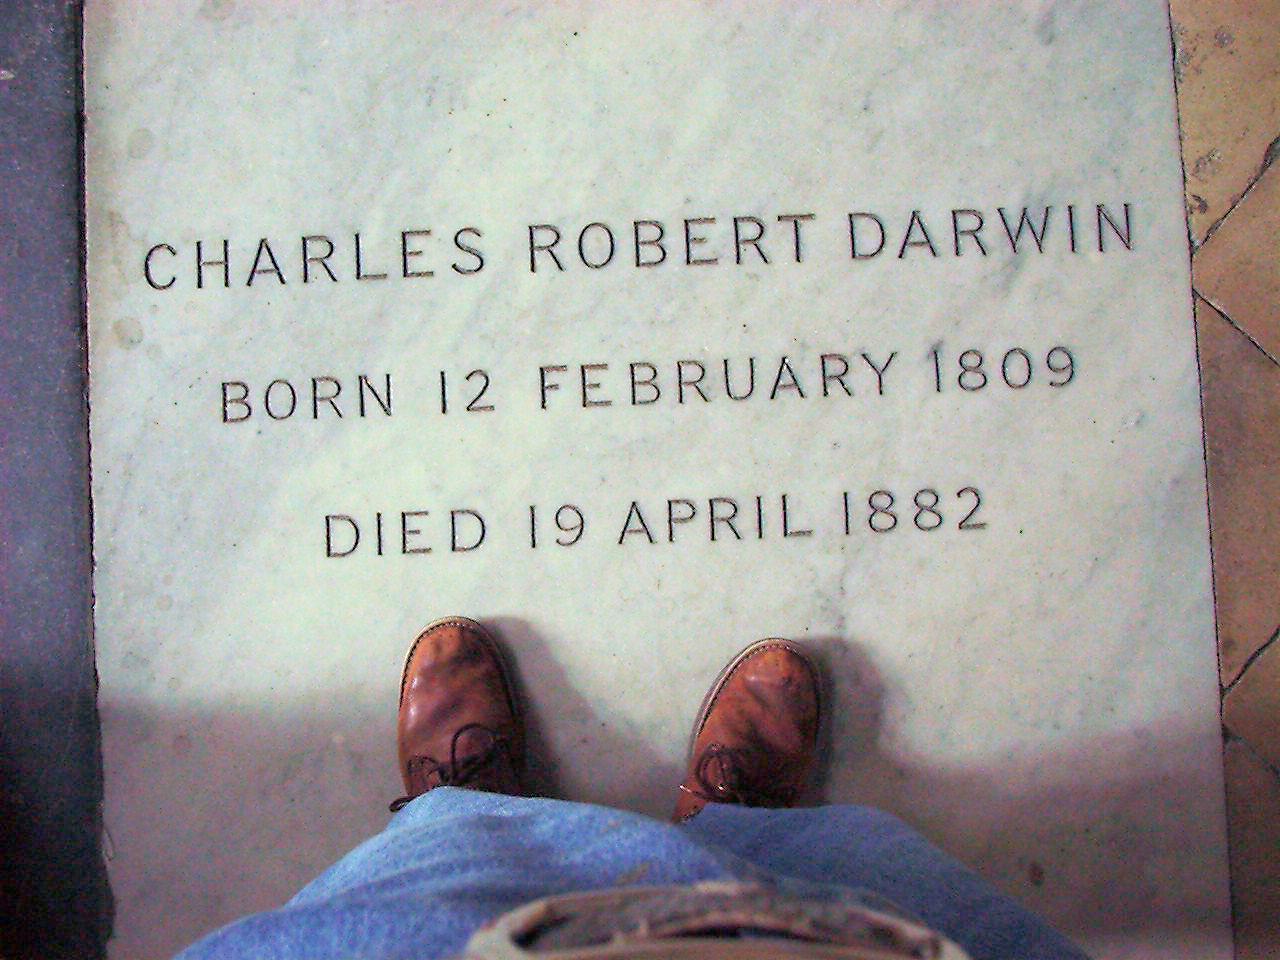 Charles Darwins grave stone